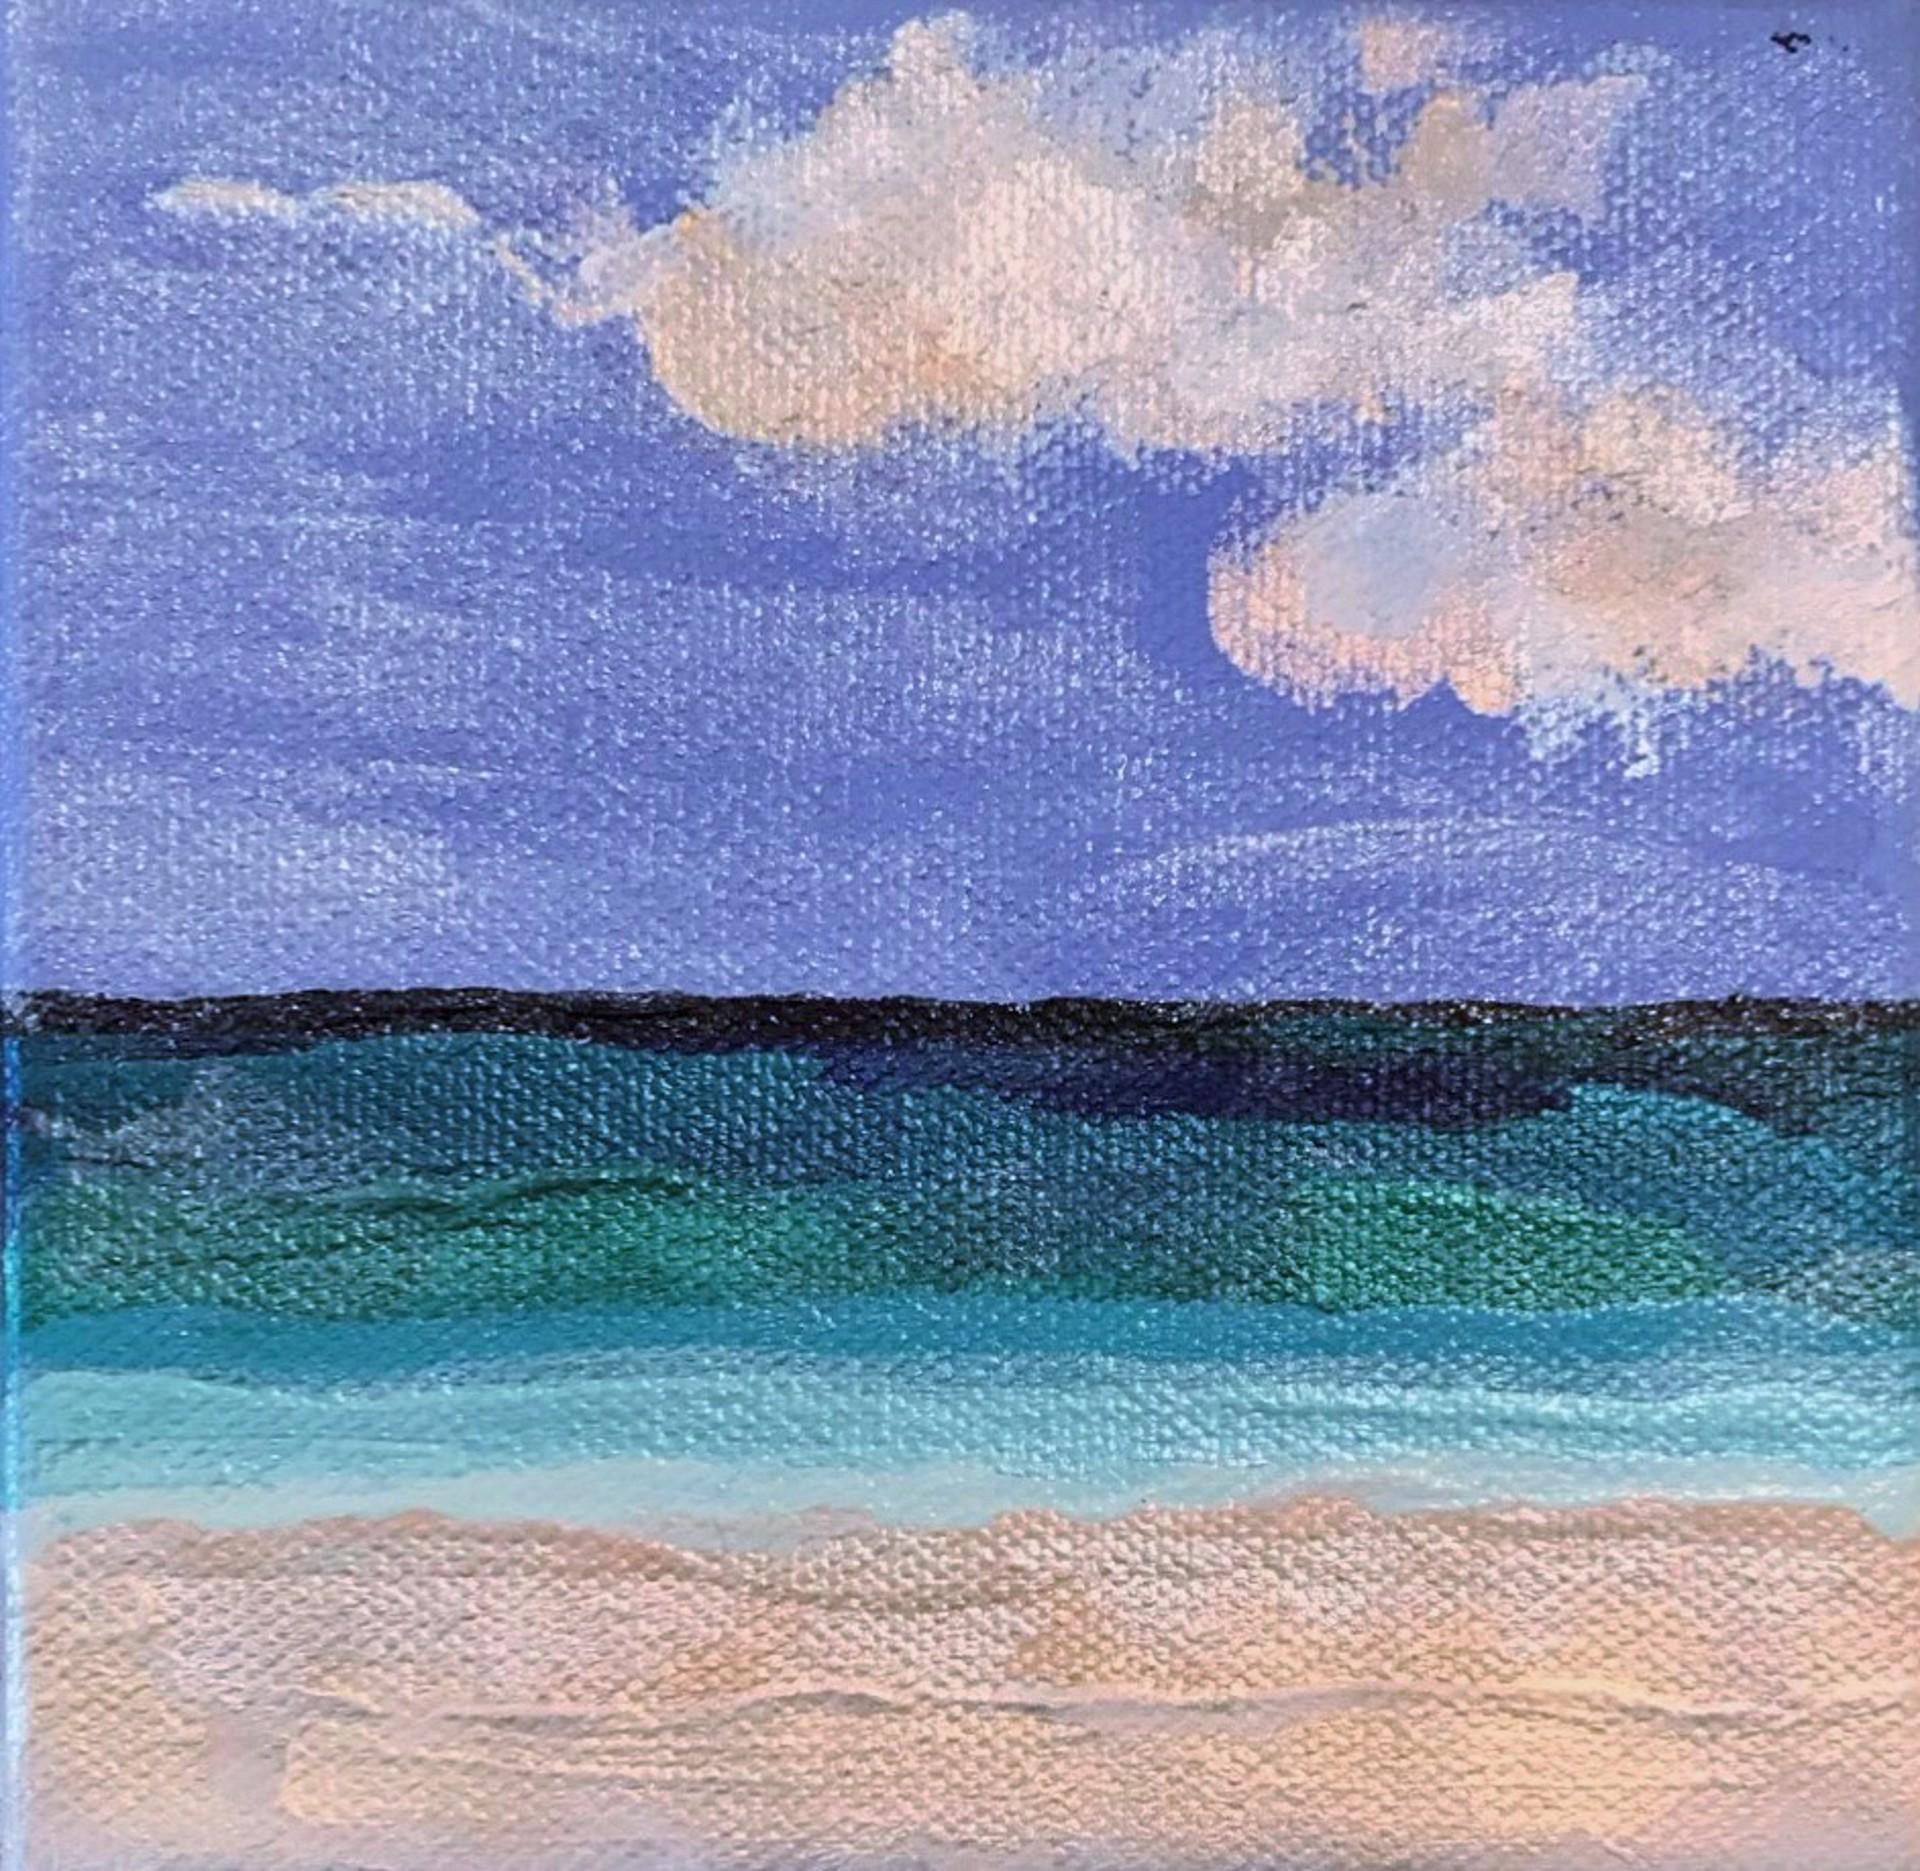 Beachfront No. 4 by Leslie Poteet Busker